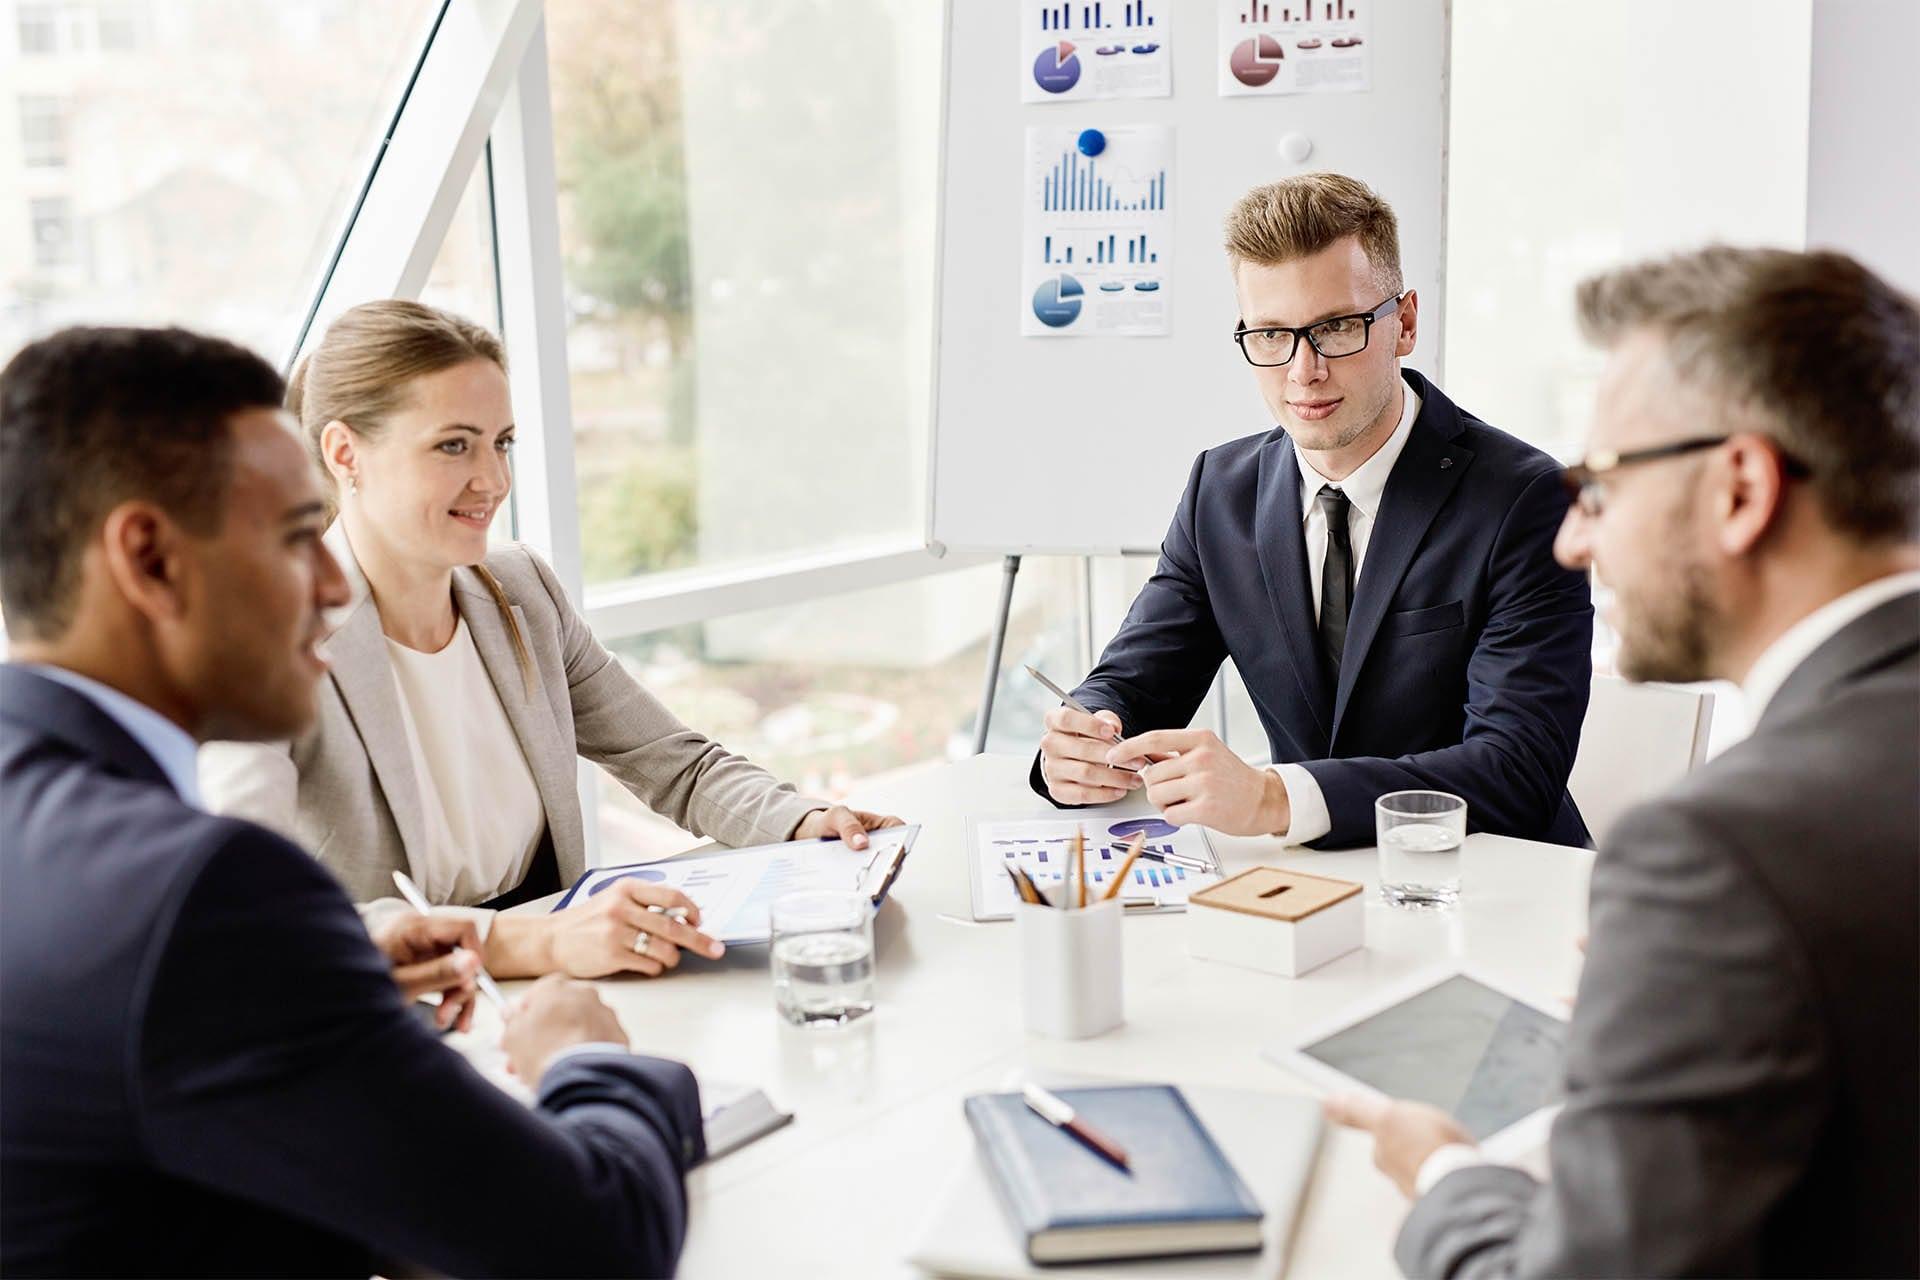 img_0012_business-meeting-PHW694U-min